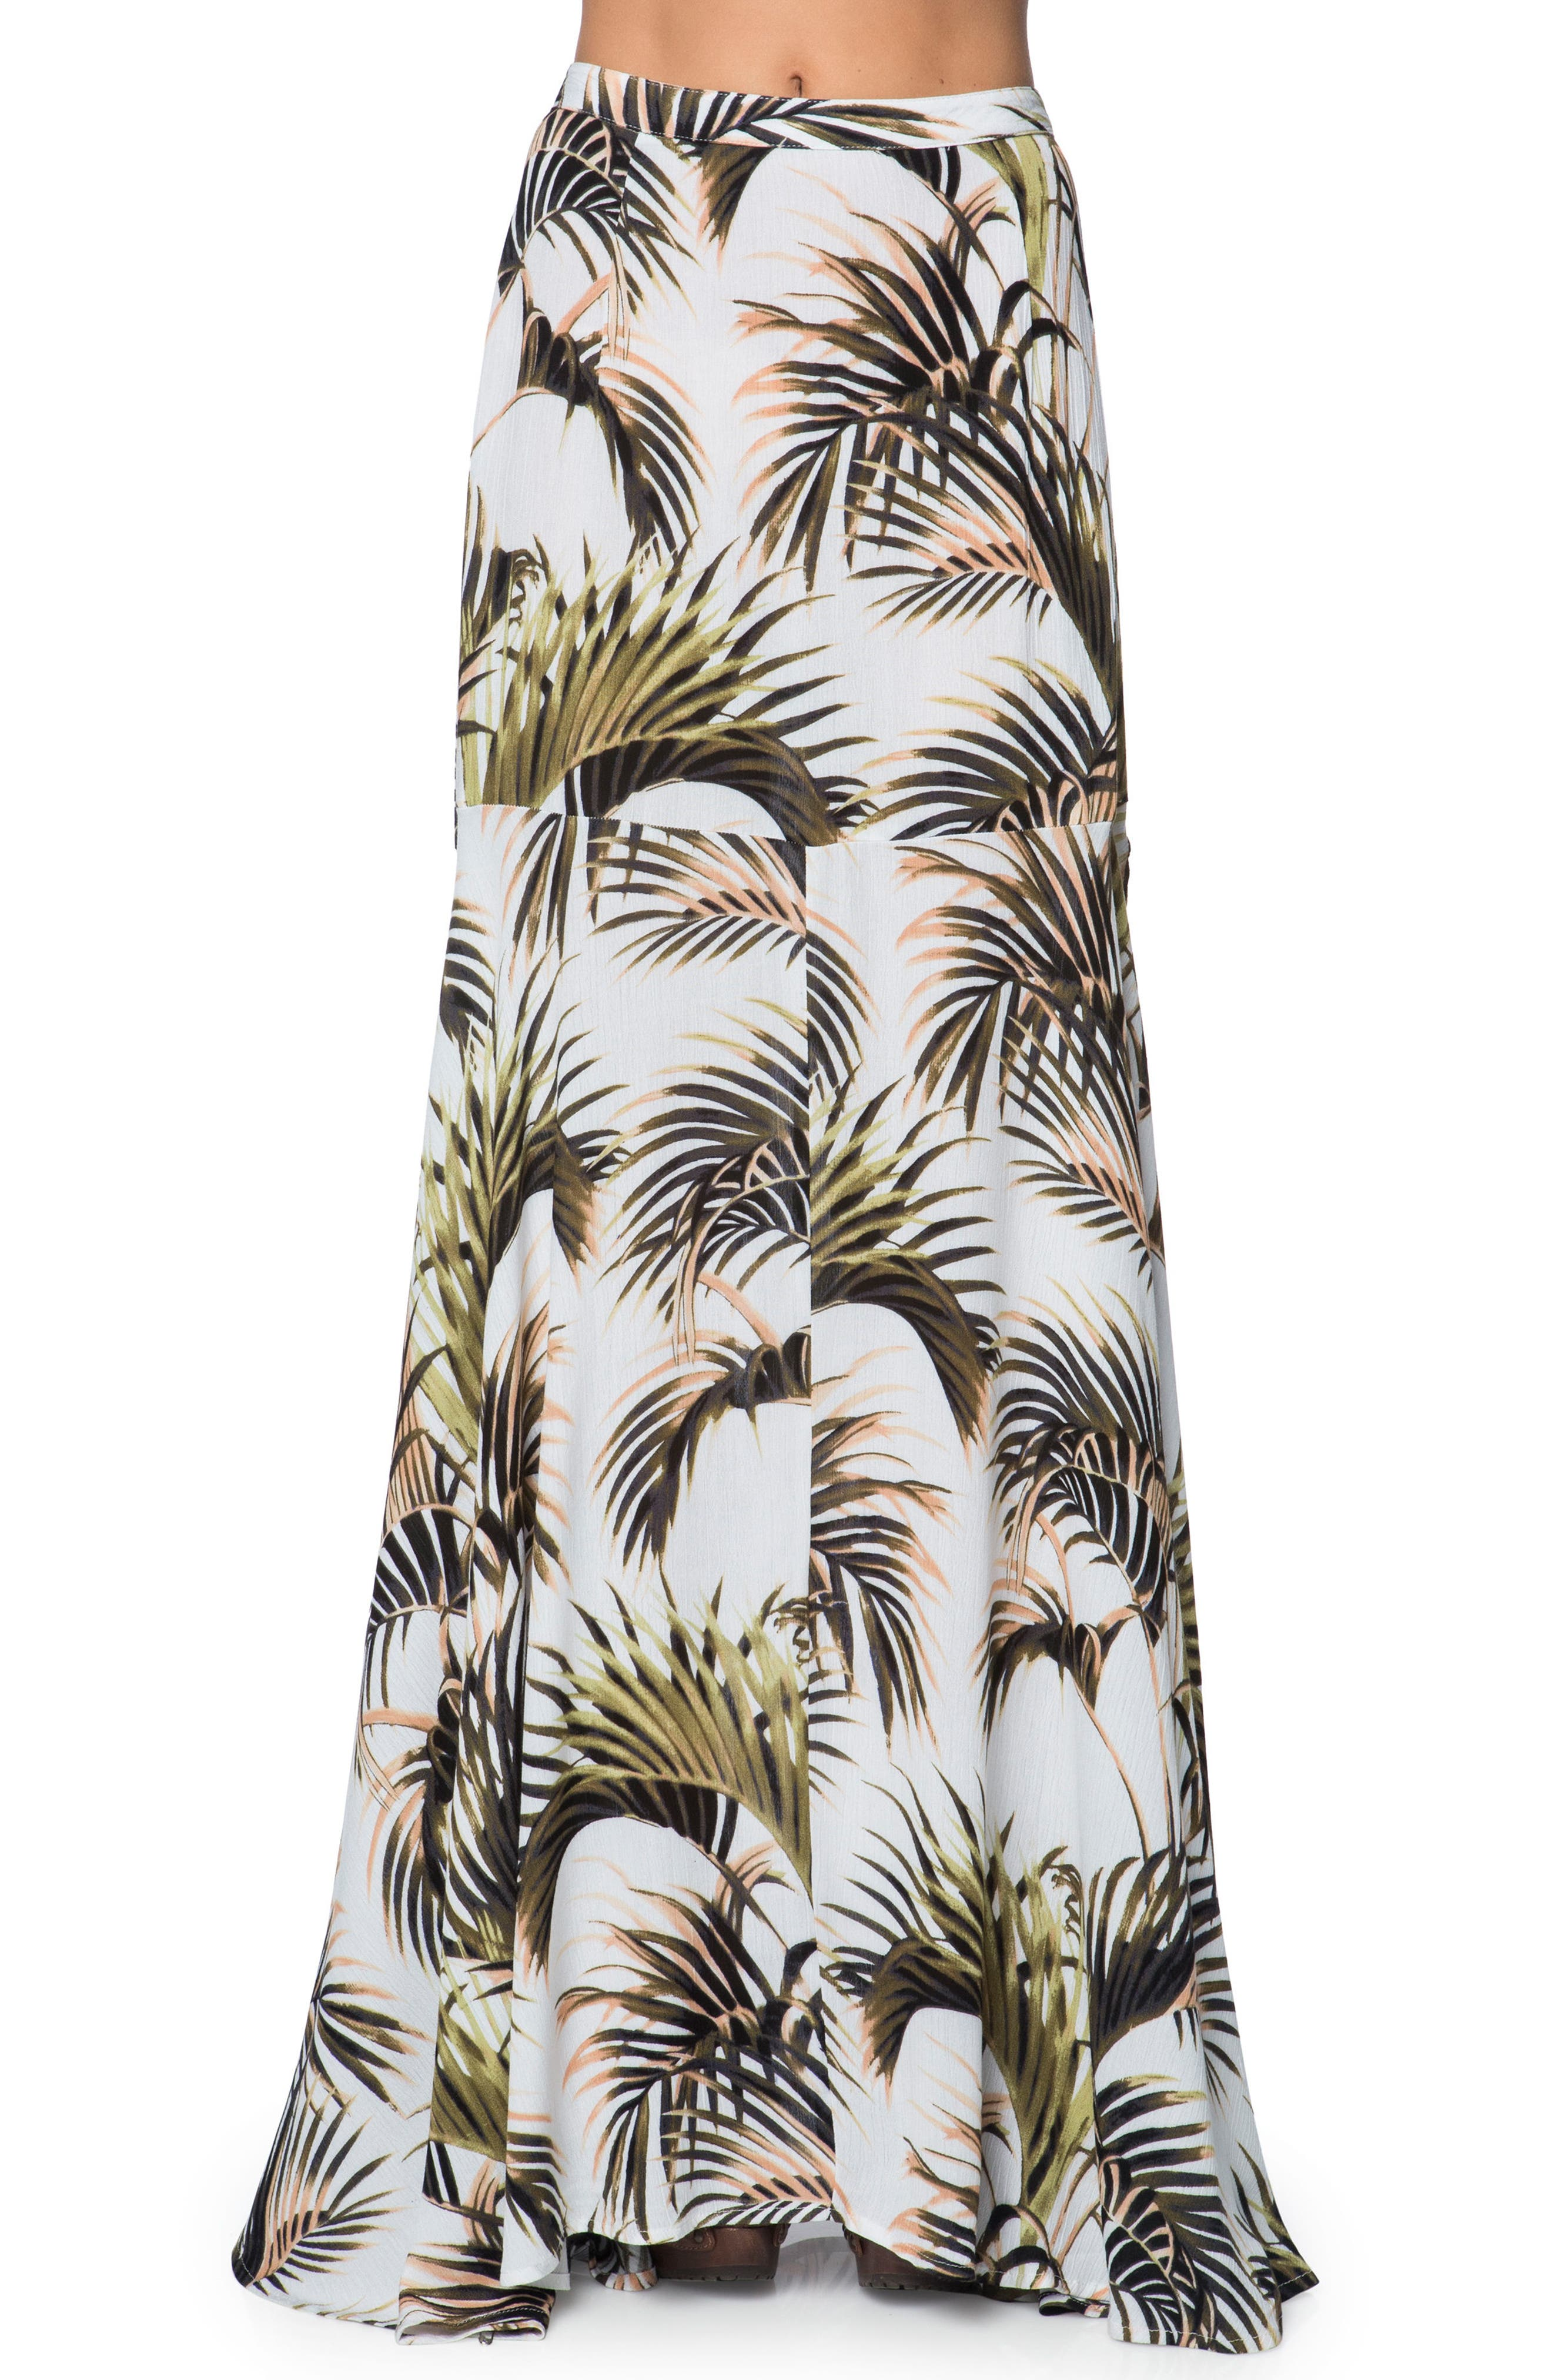 Main Image - O'Neill Nosara Slit Maxi Skirt